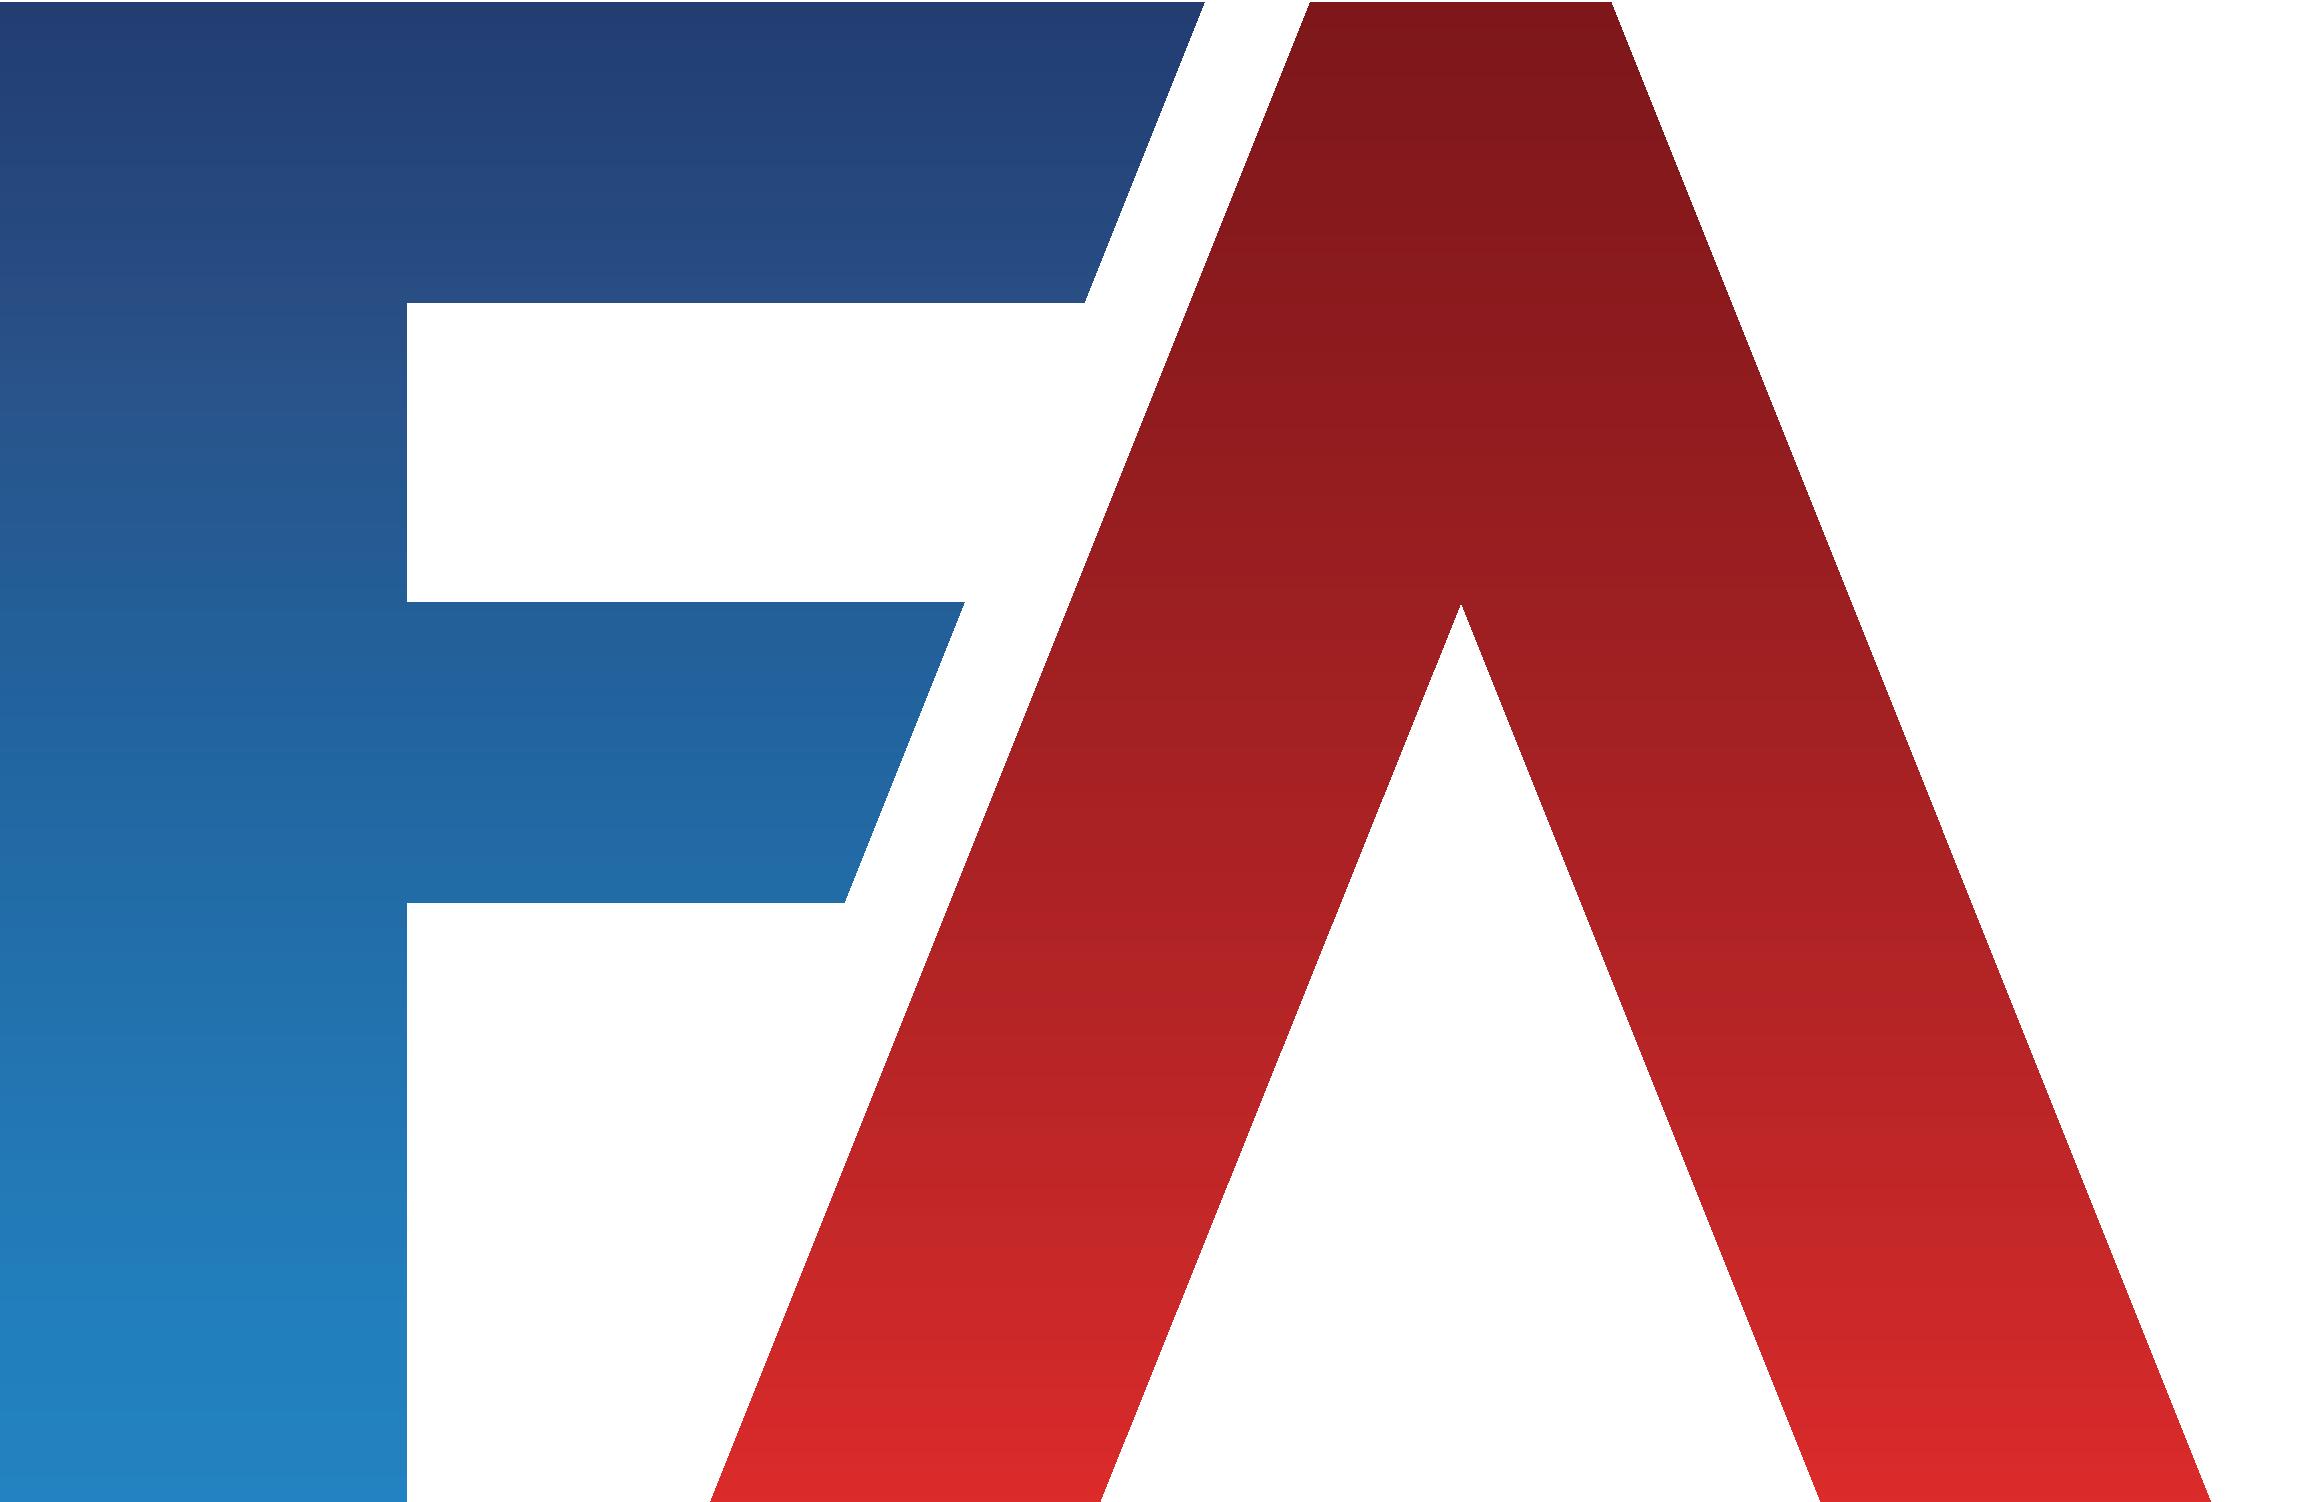 Eric Ebron - TE | FantasyAlarm.com